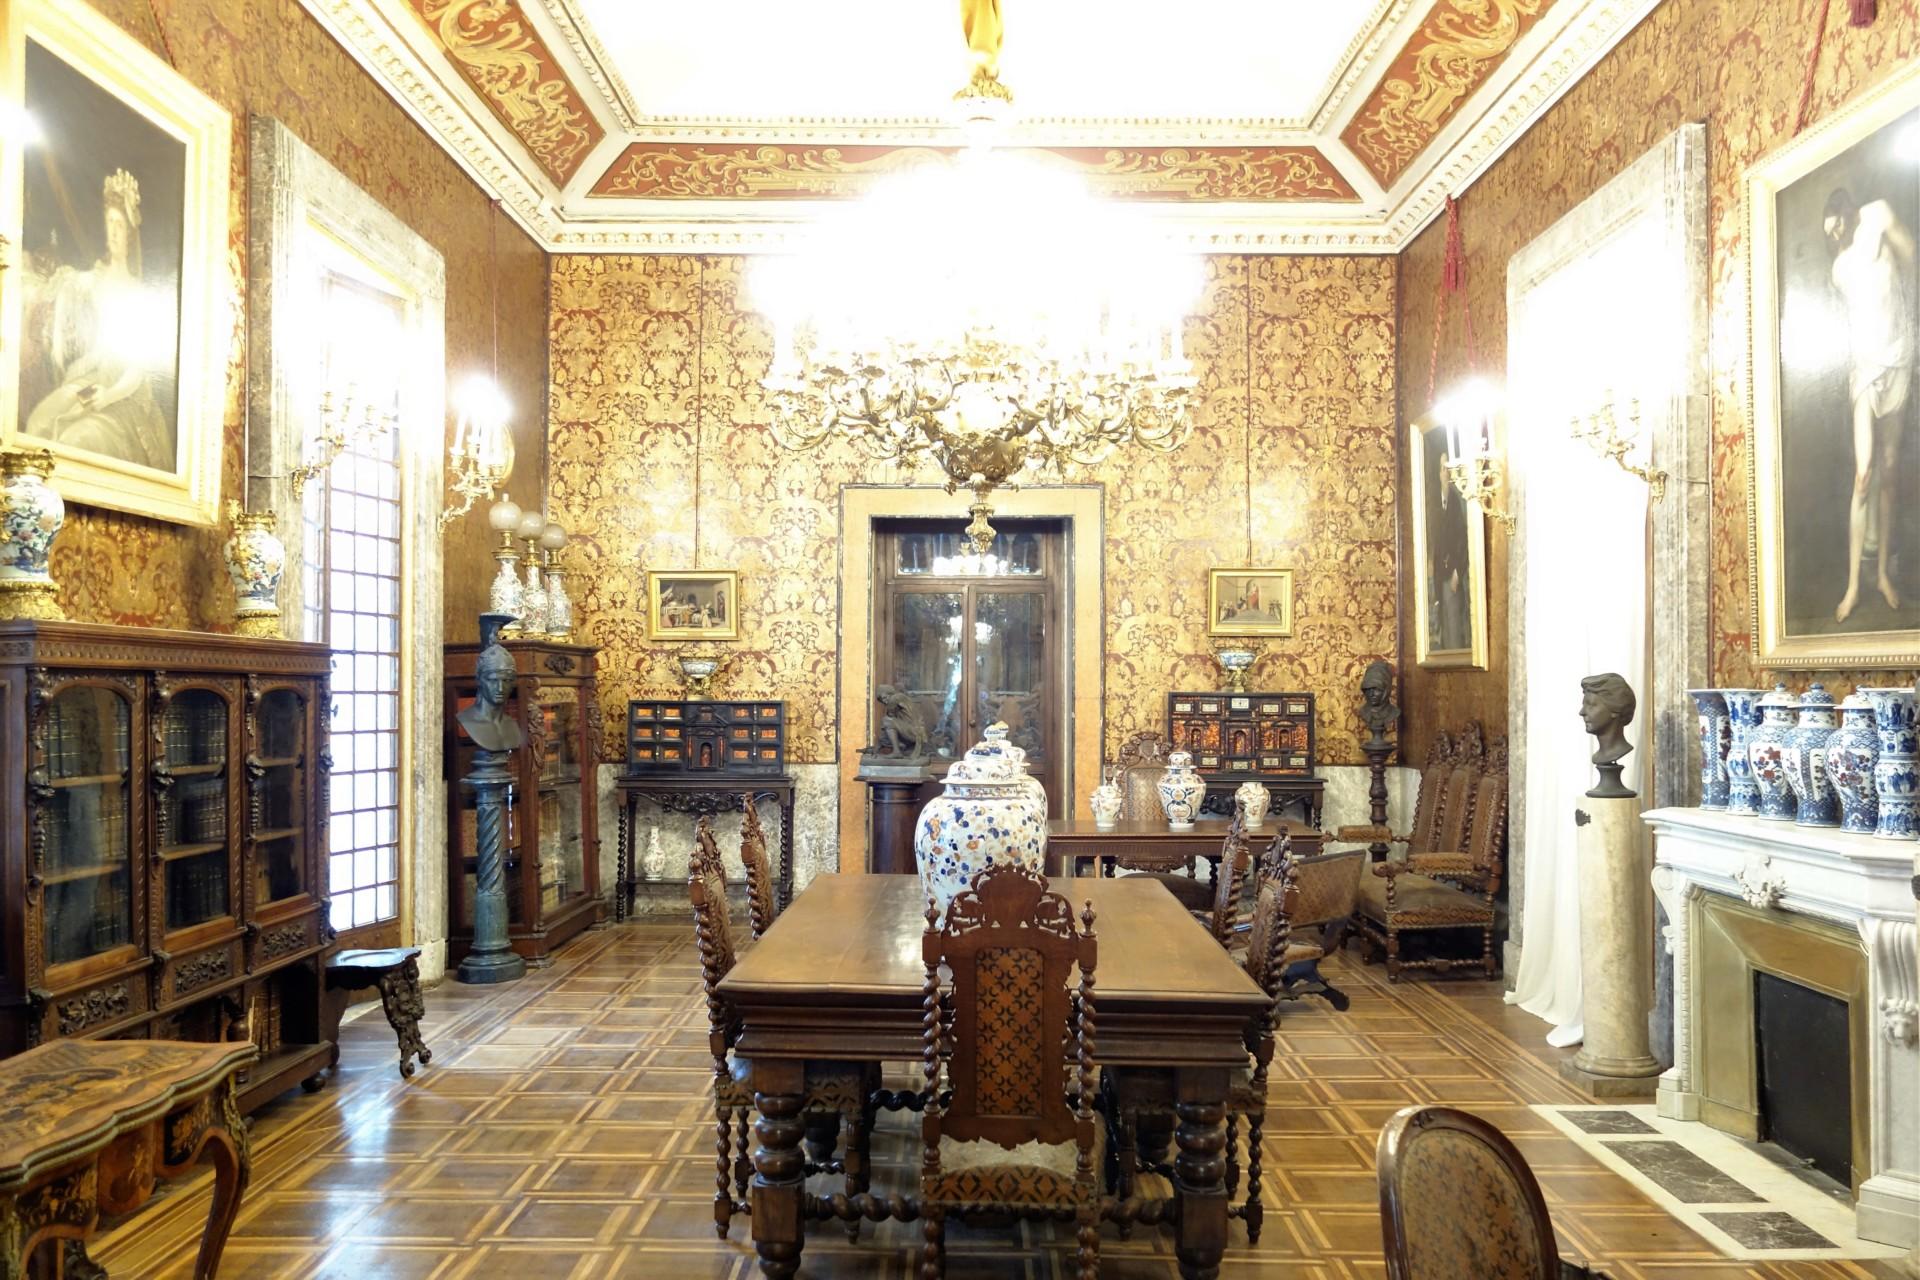 Villa Pignatei lldas goldene Zimmer!